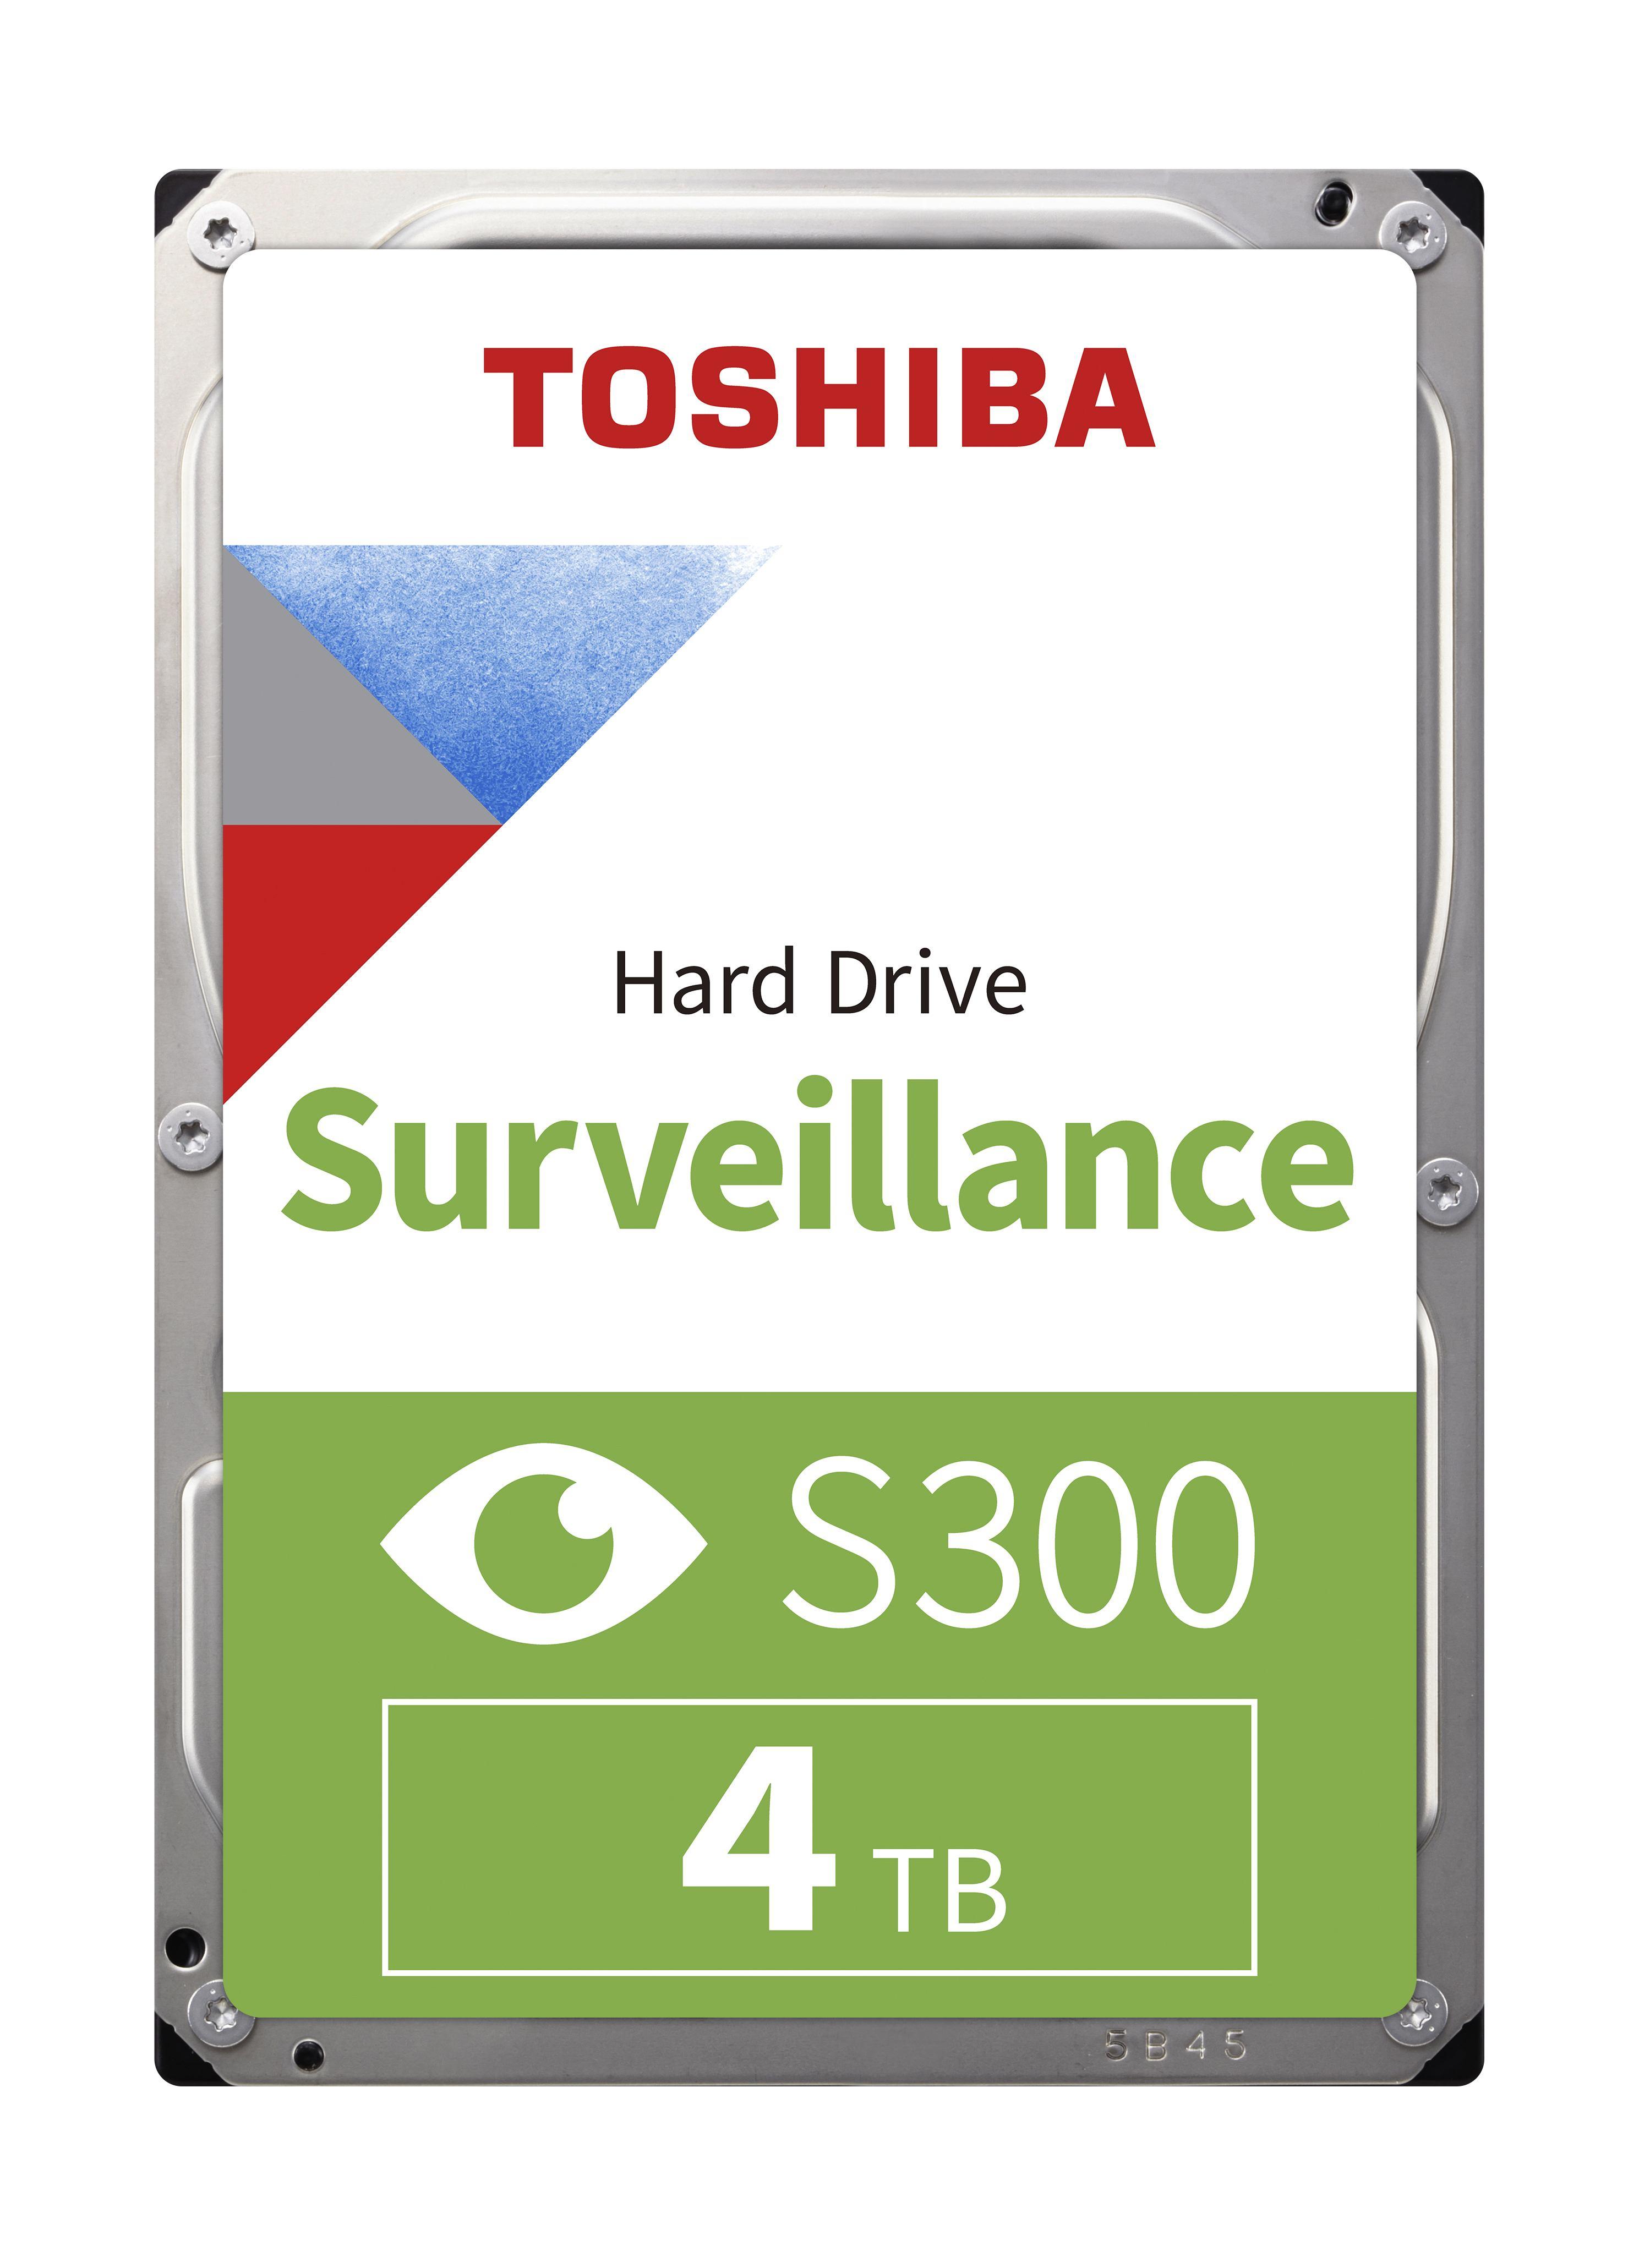 5812210-Toshiba S300 Surveillance 3.5 4000 GB Serial ATA III (S300 SURVL HARD DR